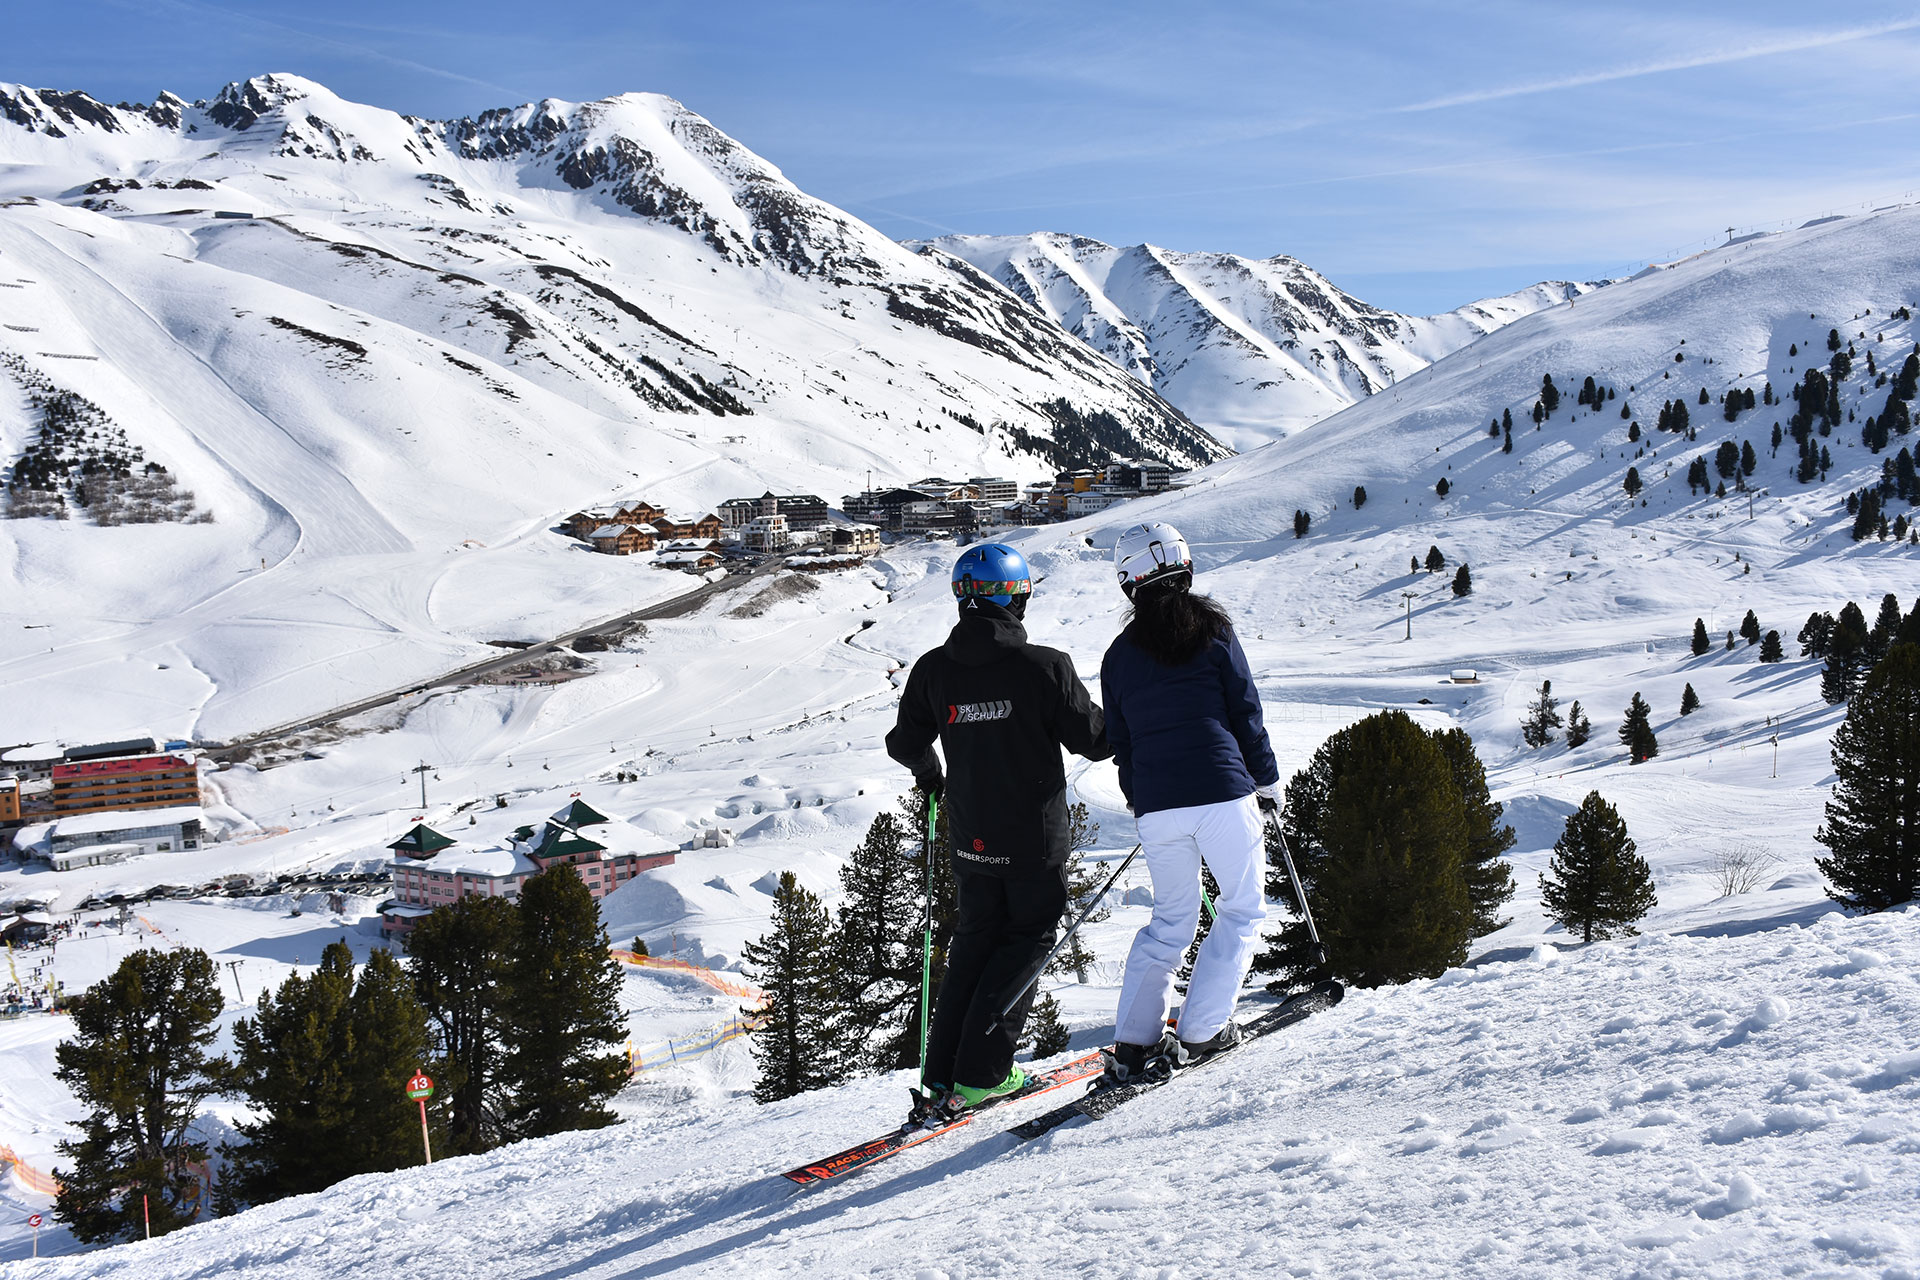 Ski school - Skiverleih Kühtai, Skischule Kühtai, Gerber Sport